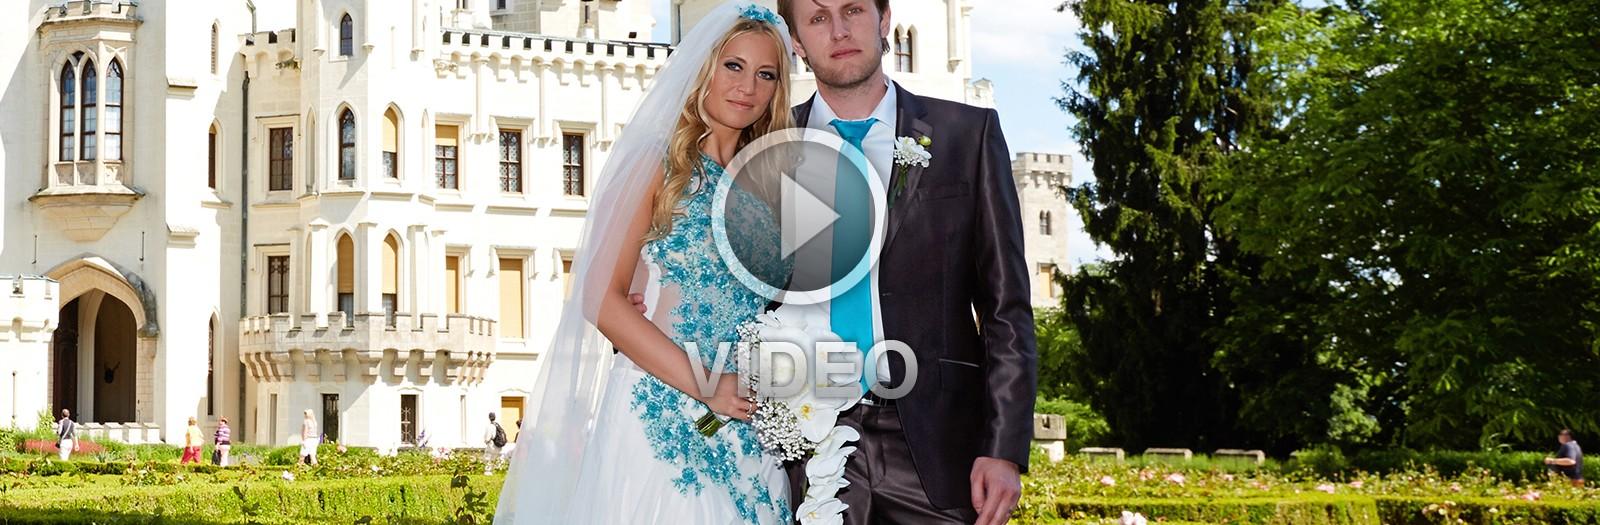 Jana a Martin - 14.6.2014 - video